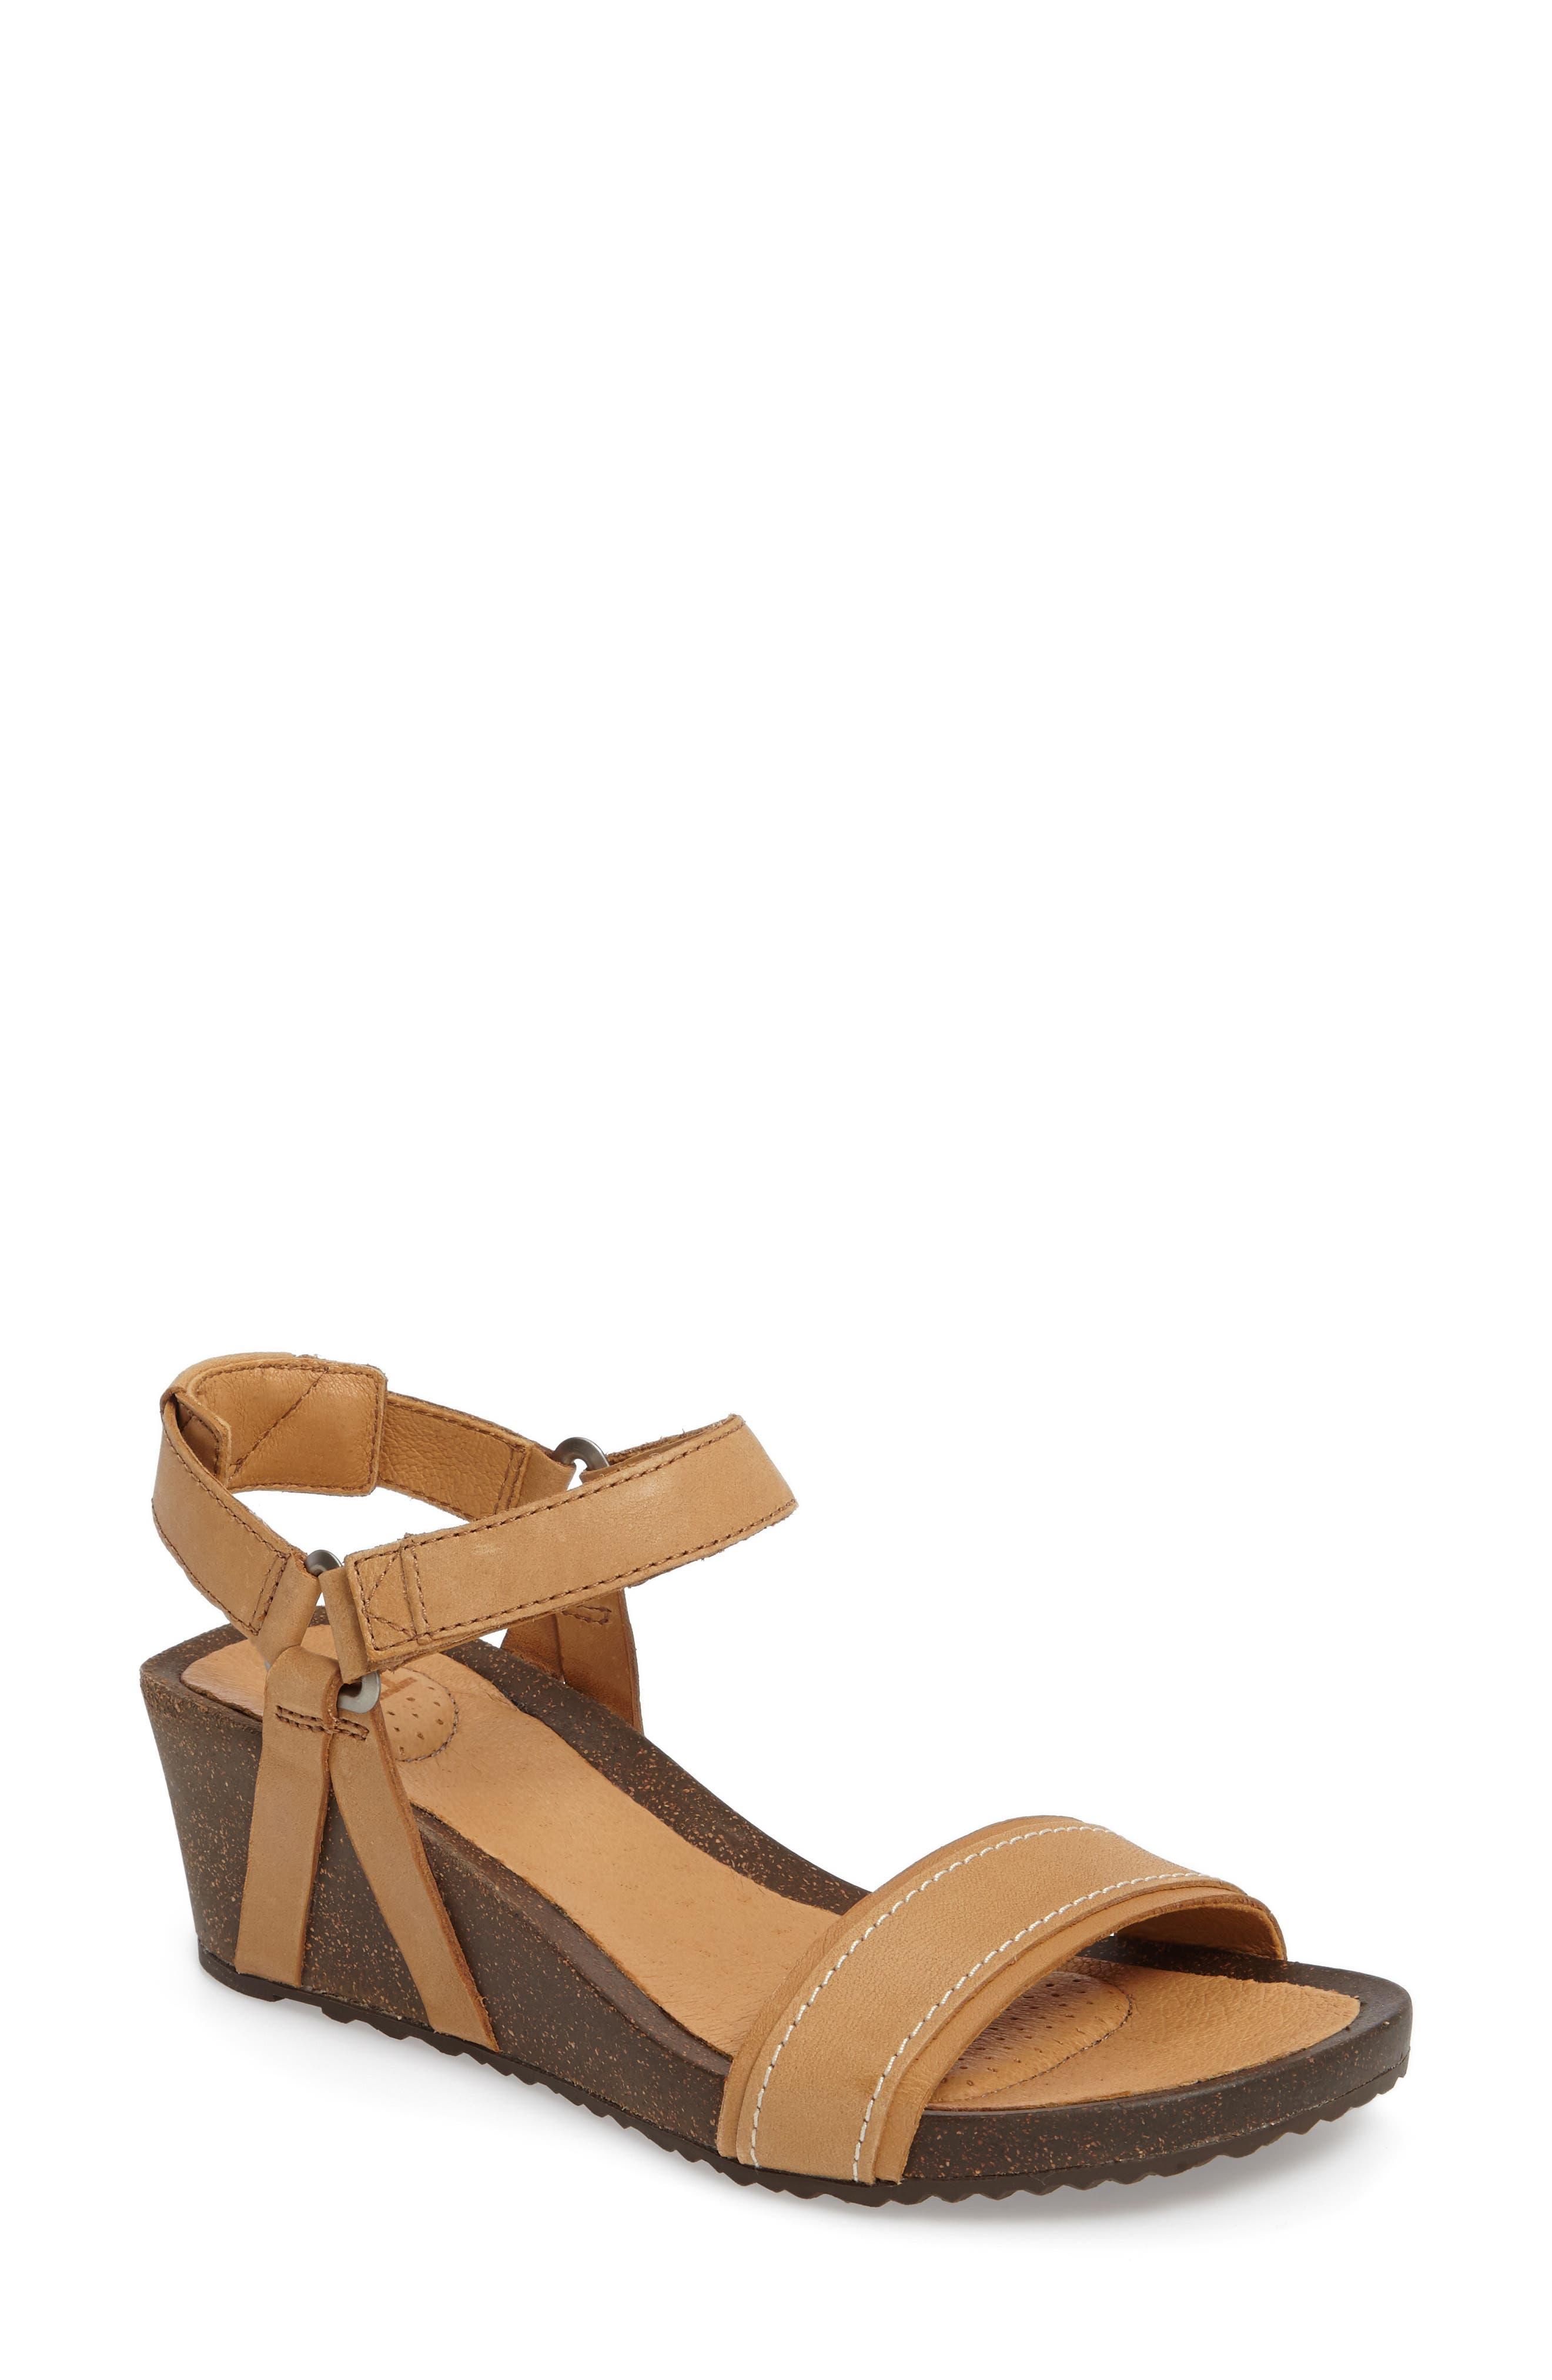 Main Image - Teva Ysidro Stitch Wedge Sandal (Women)